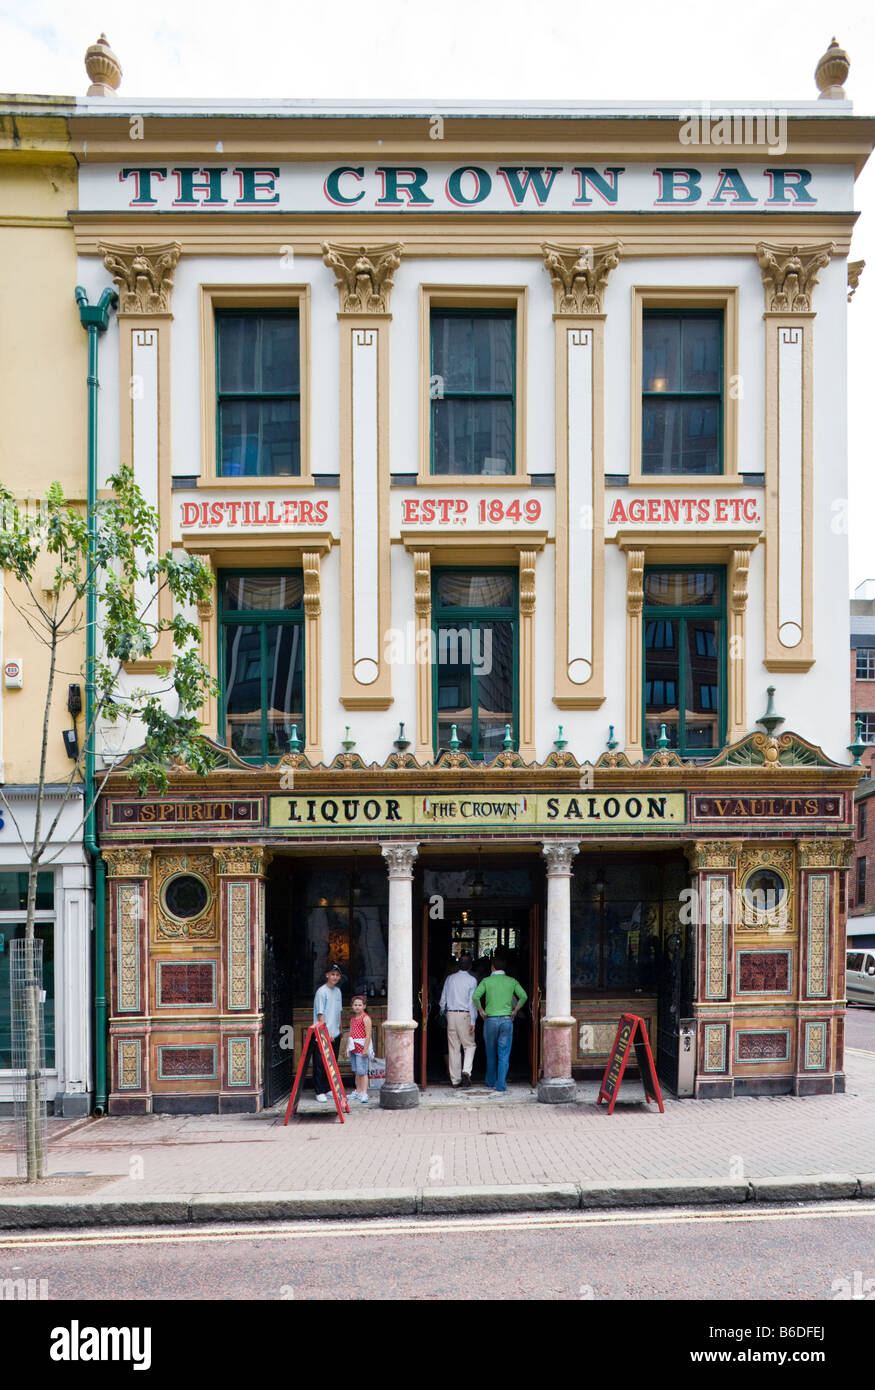 The Crown Bar and Liquor Saloon, Belfast, Northern Ireland - Stock Image